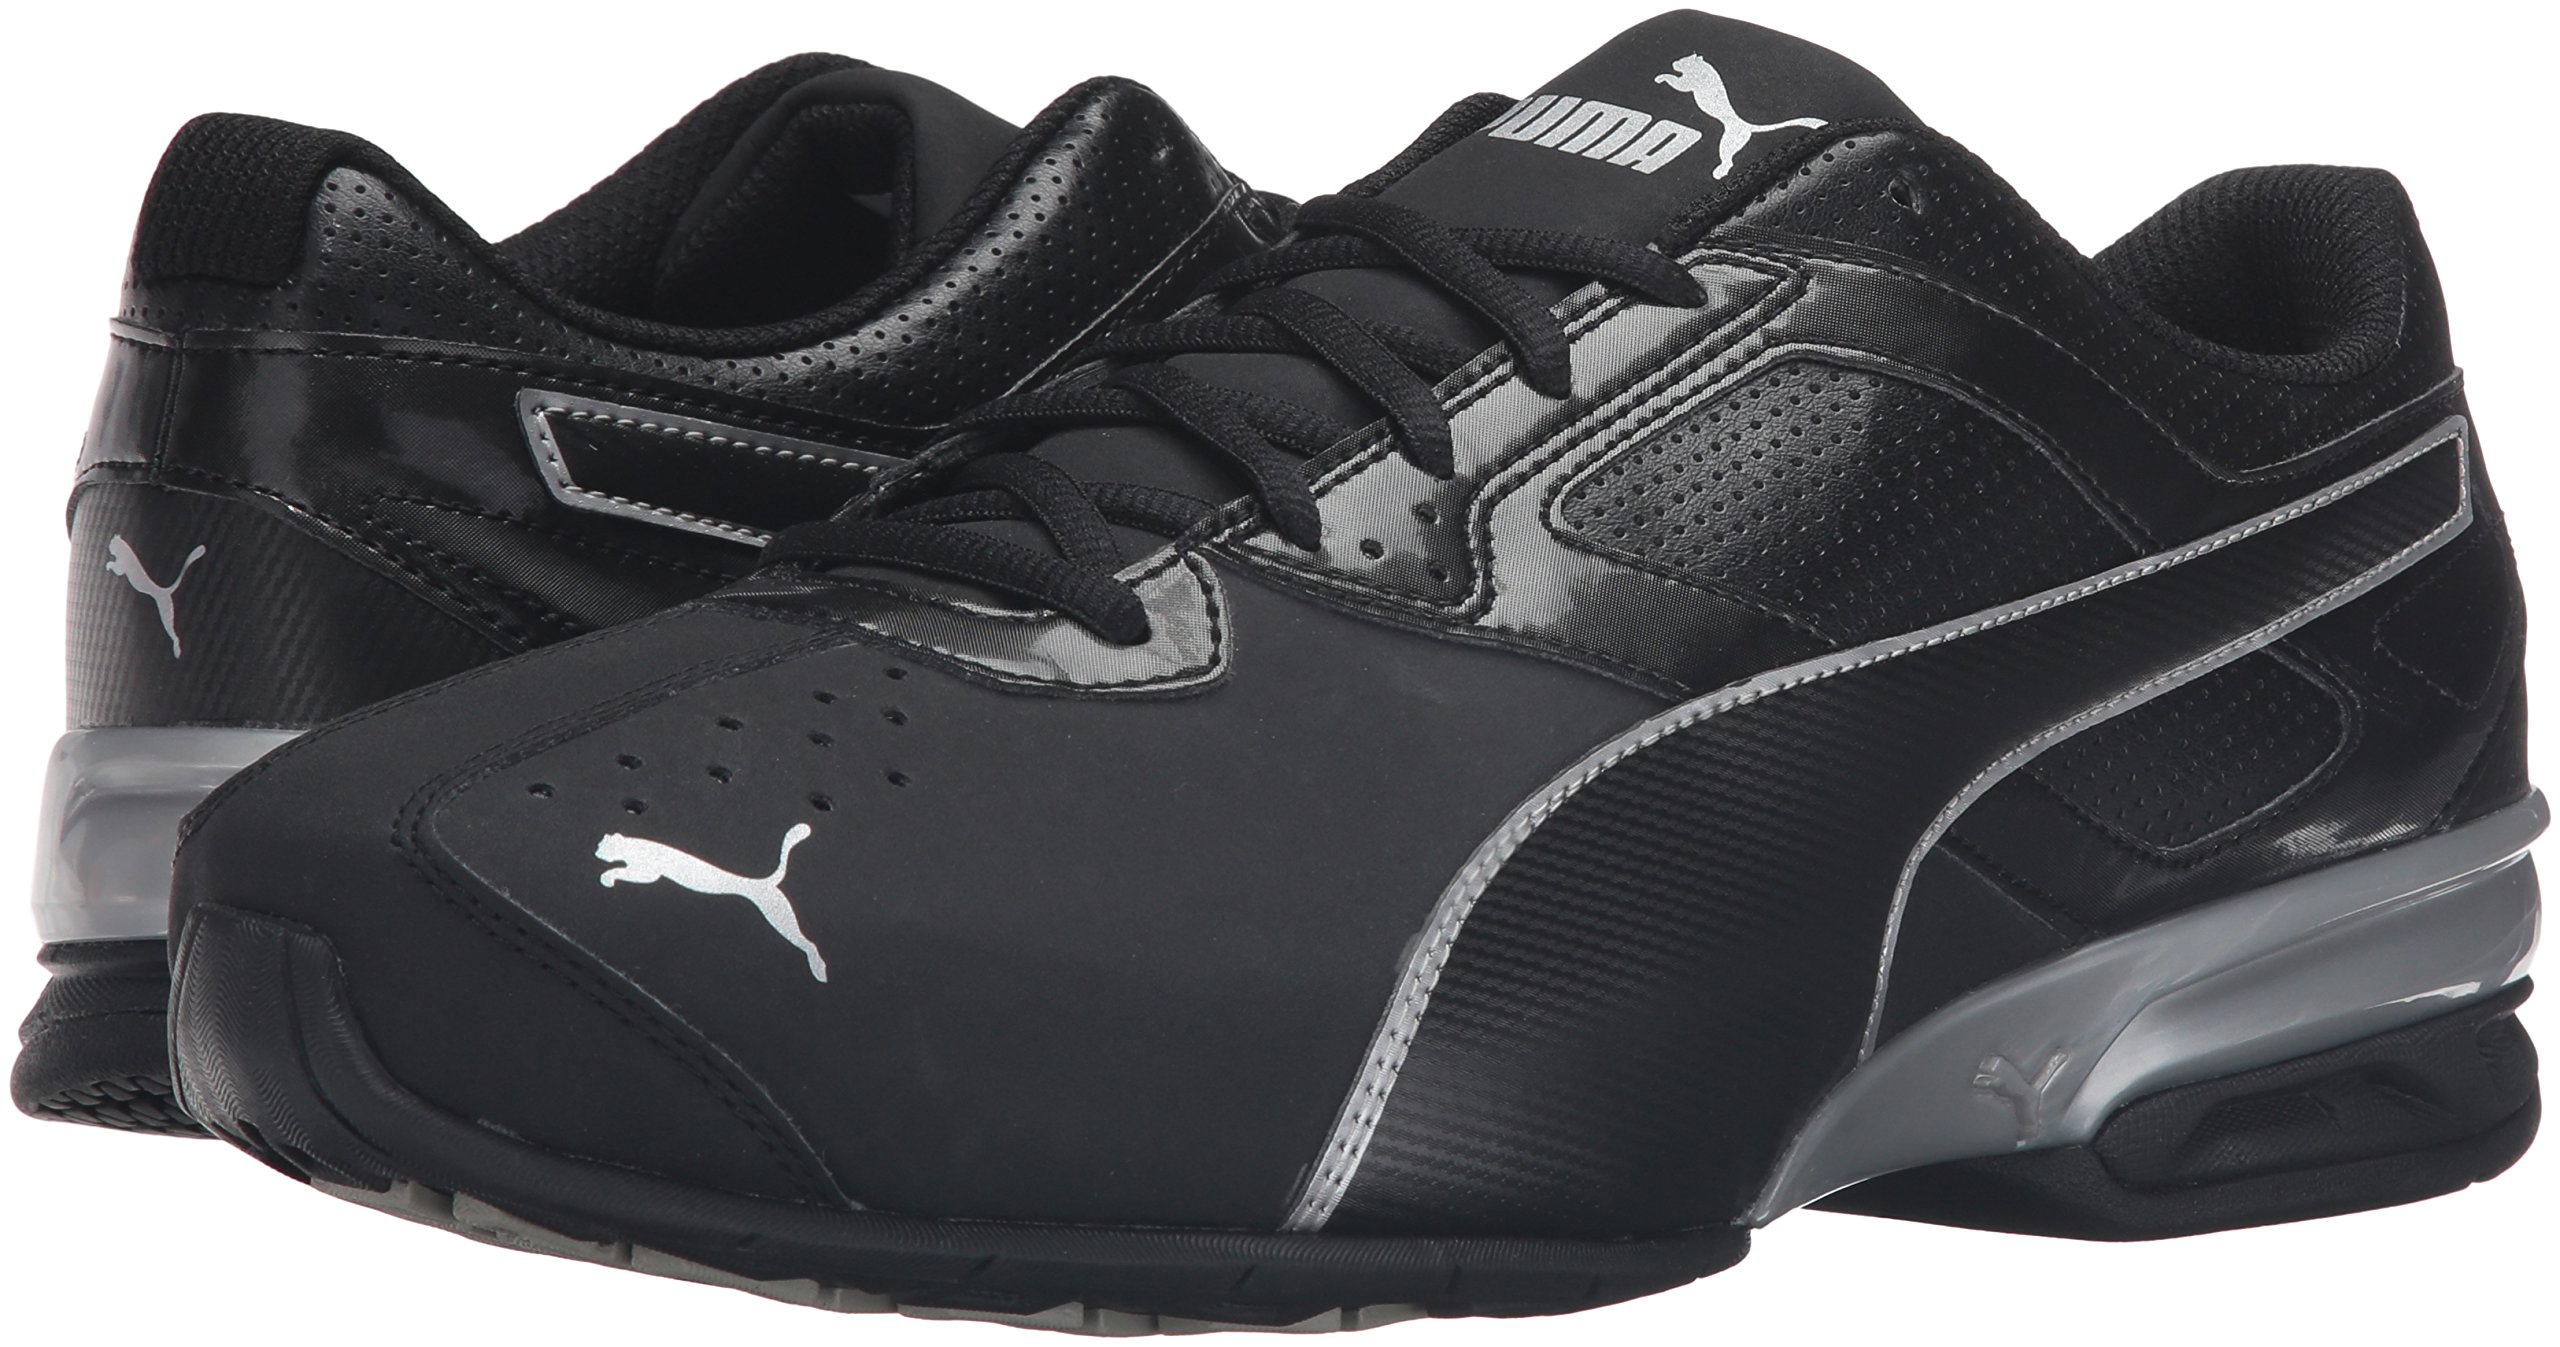 PUMA Men's Tazon 6 FM Puma Black/ Puma Silver Running Shoe - 8 D(M) US by PUMA (Image #6)